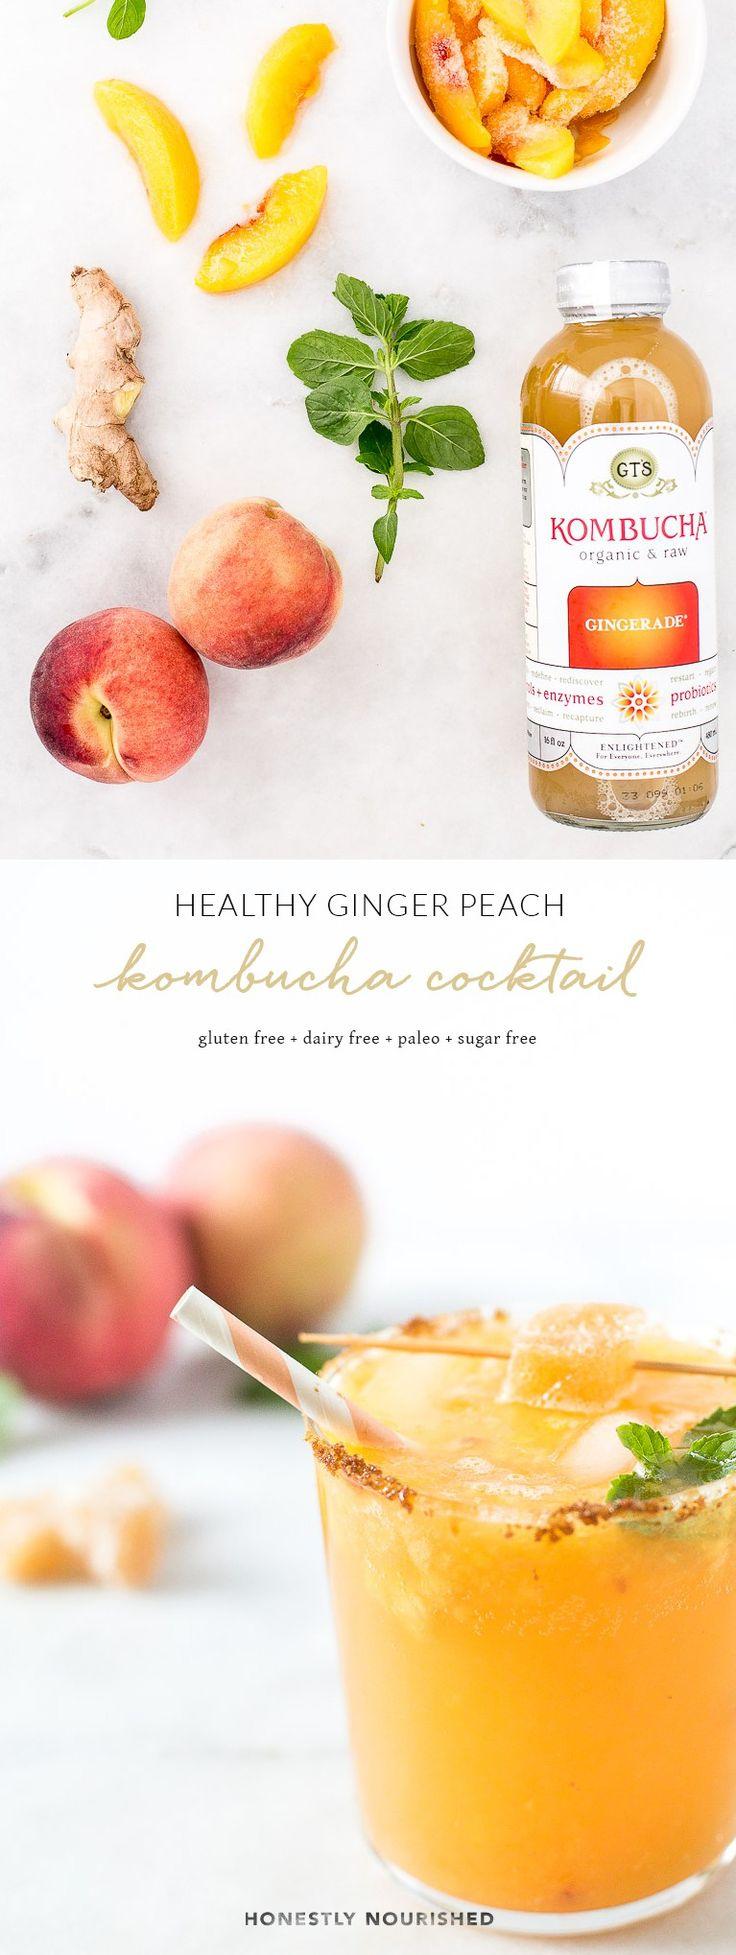 Mocktail magic: virgin cocktail with ginger peach kombucha